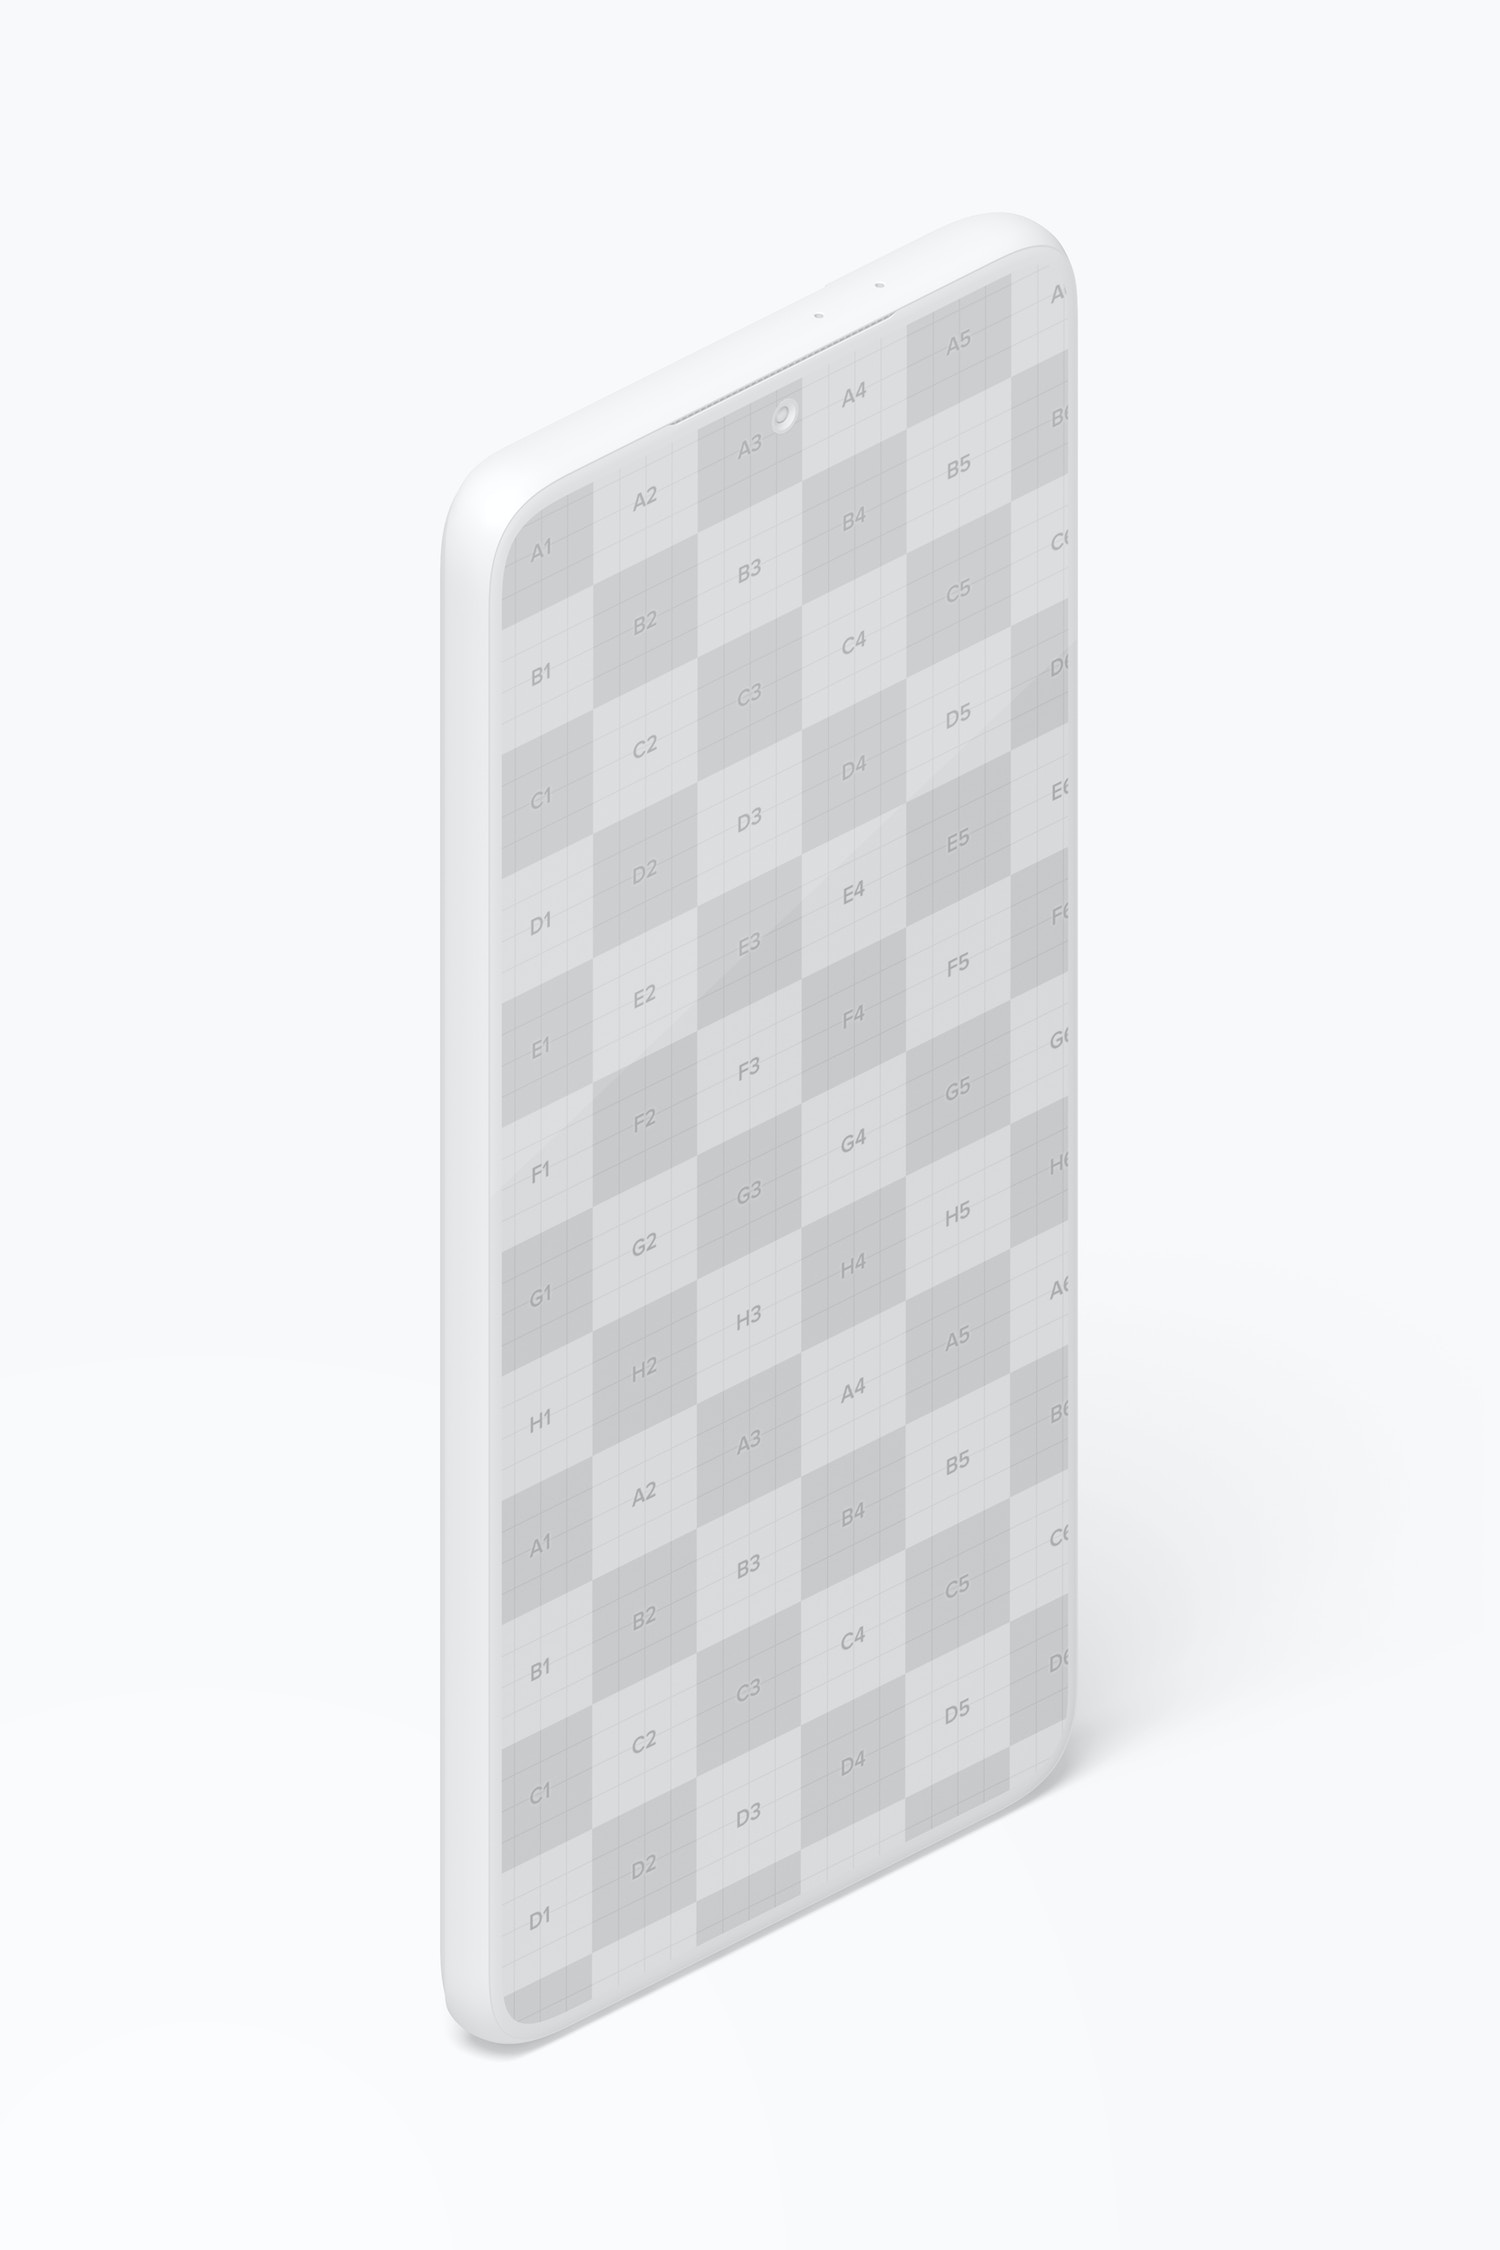 Isometric Clay Samsung S21 Mockup, Portrait Left View